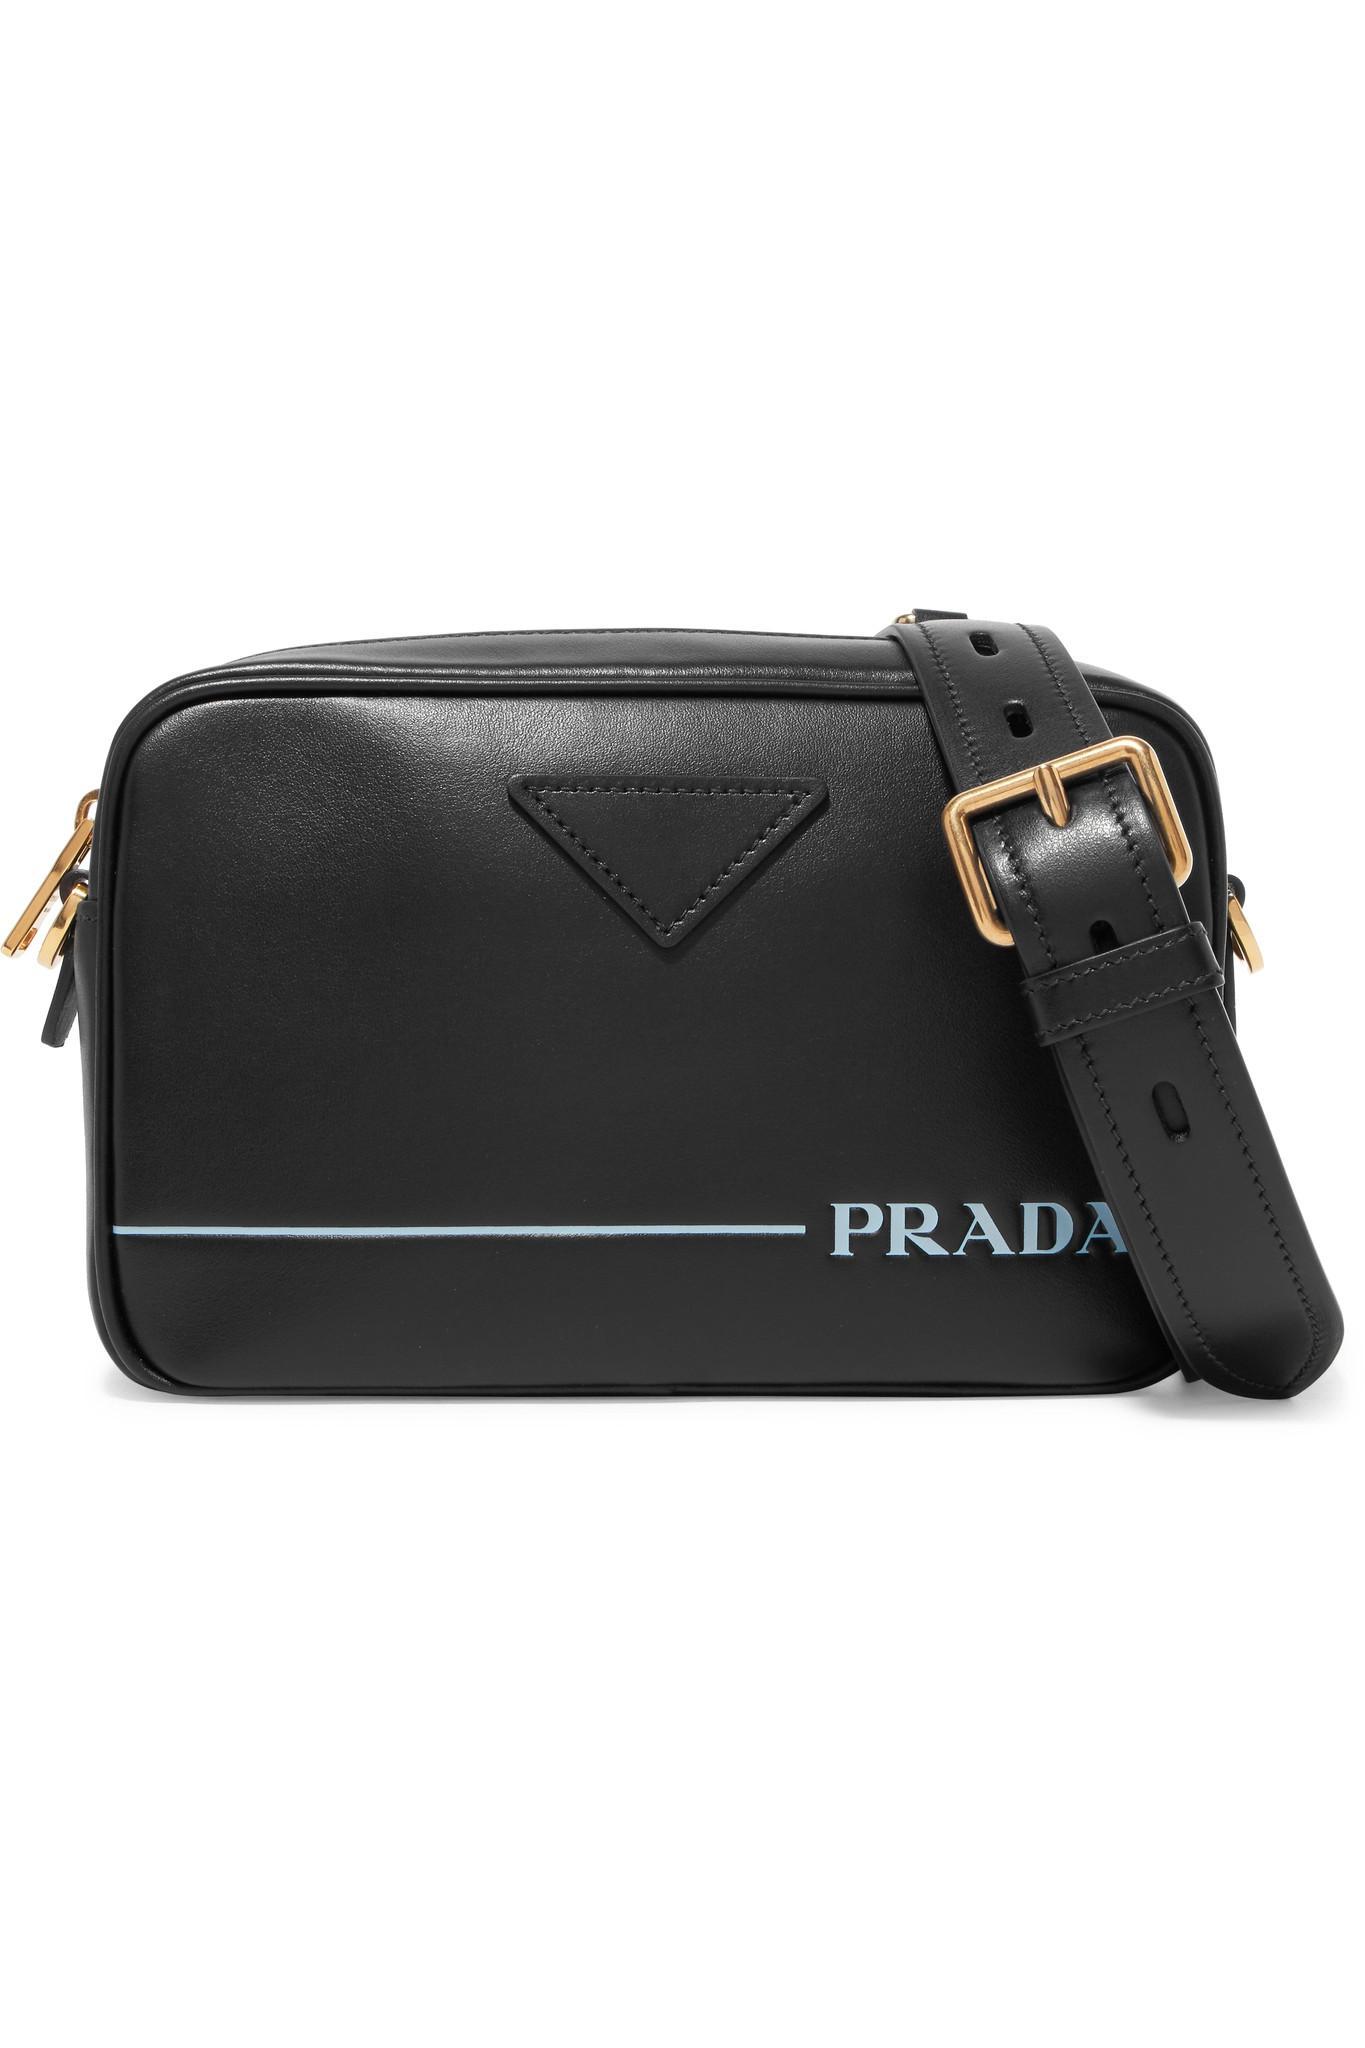 19d1118df08440 Prada Mirage Leather Camera Bag in Black - Lyst